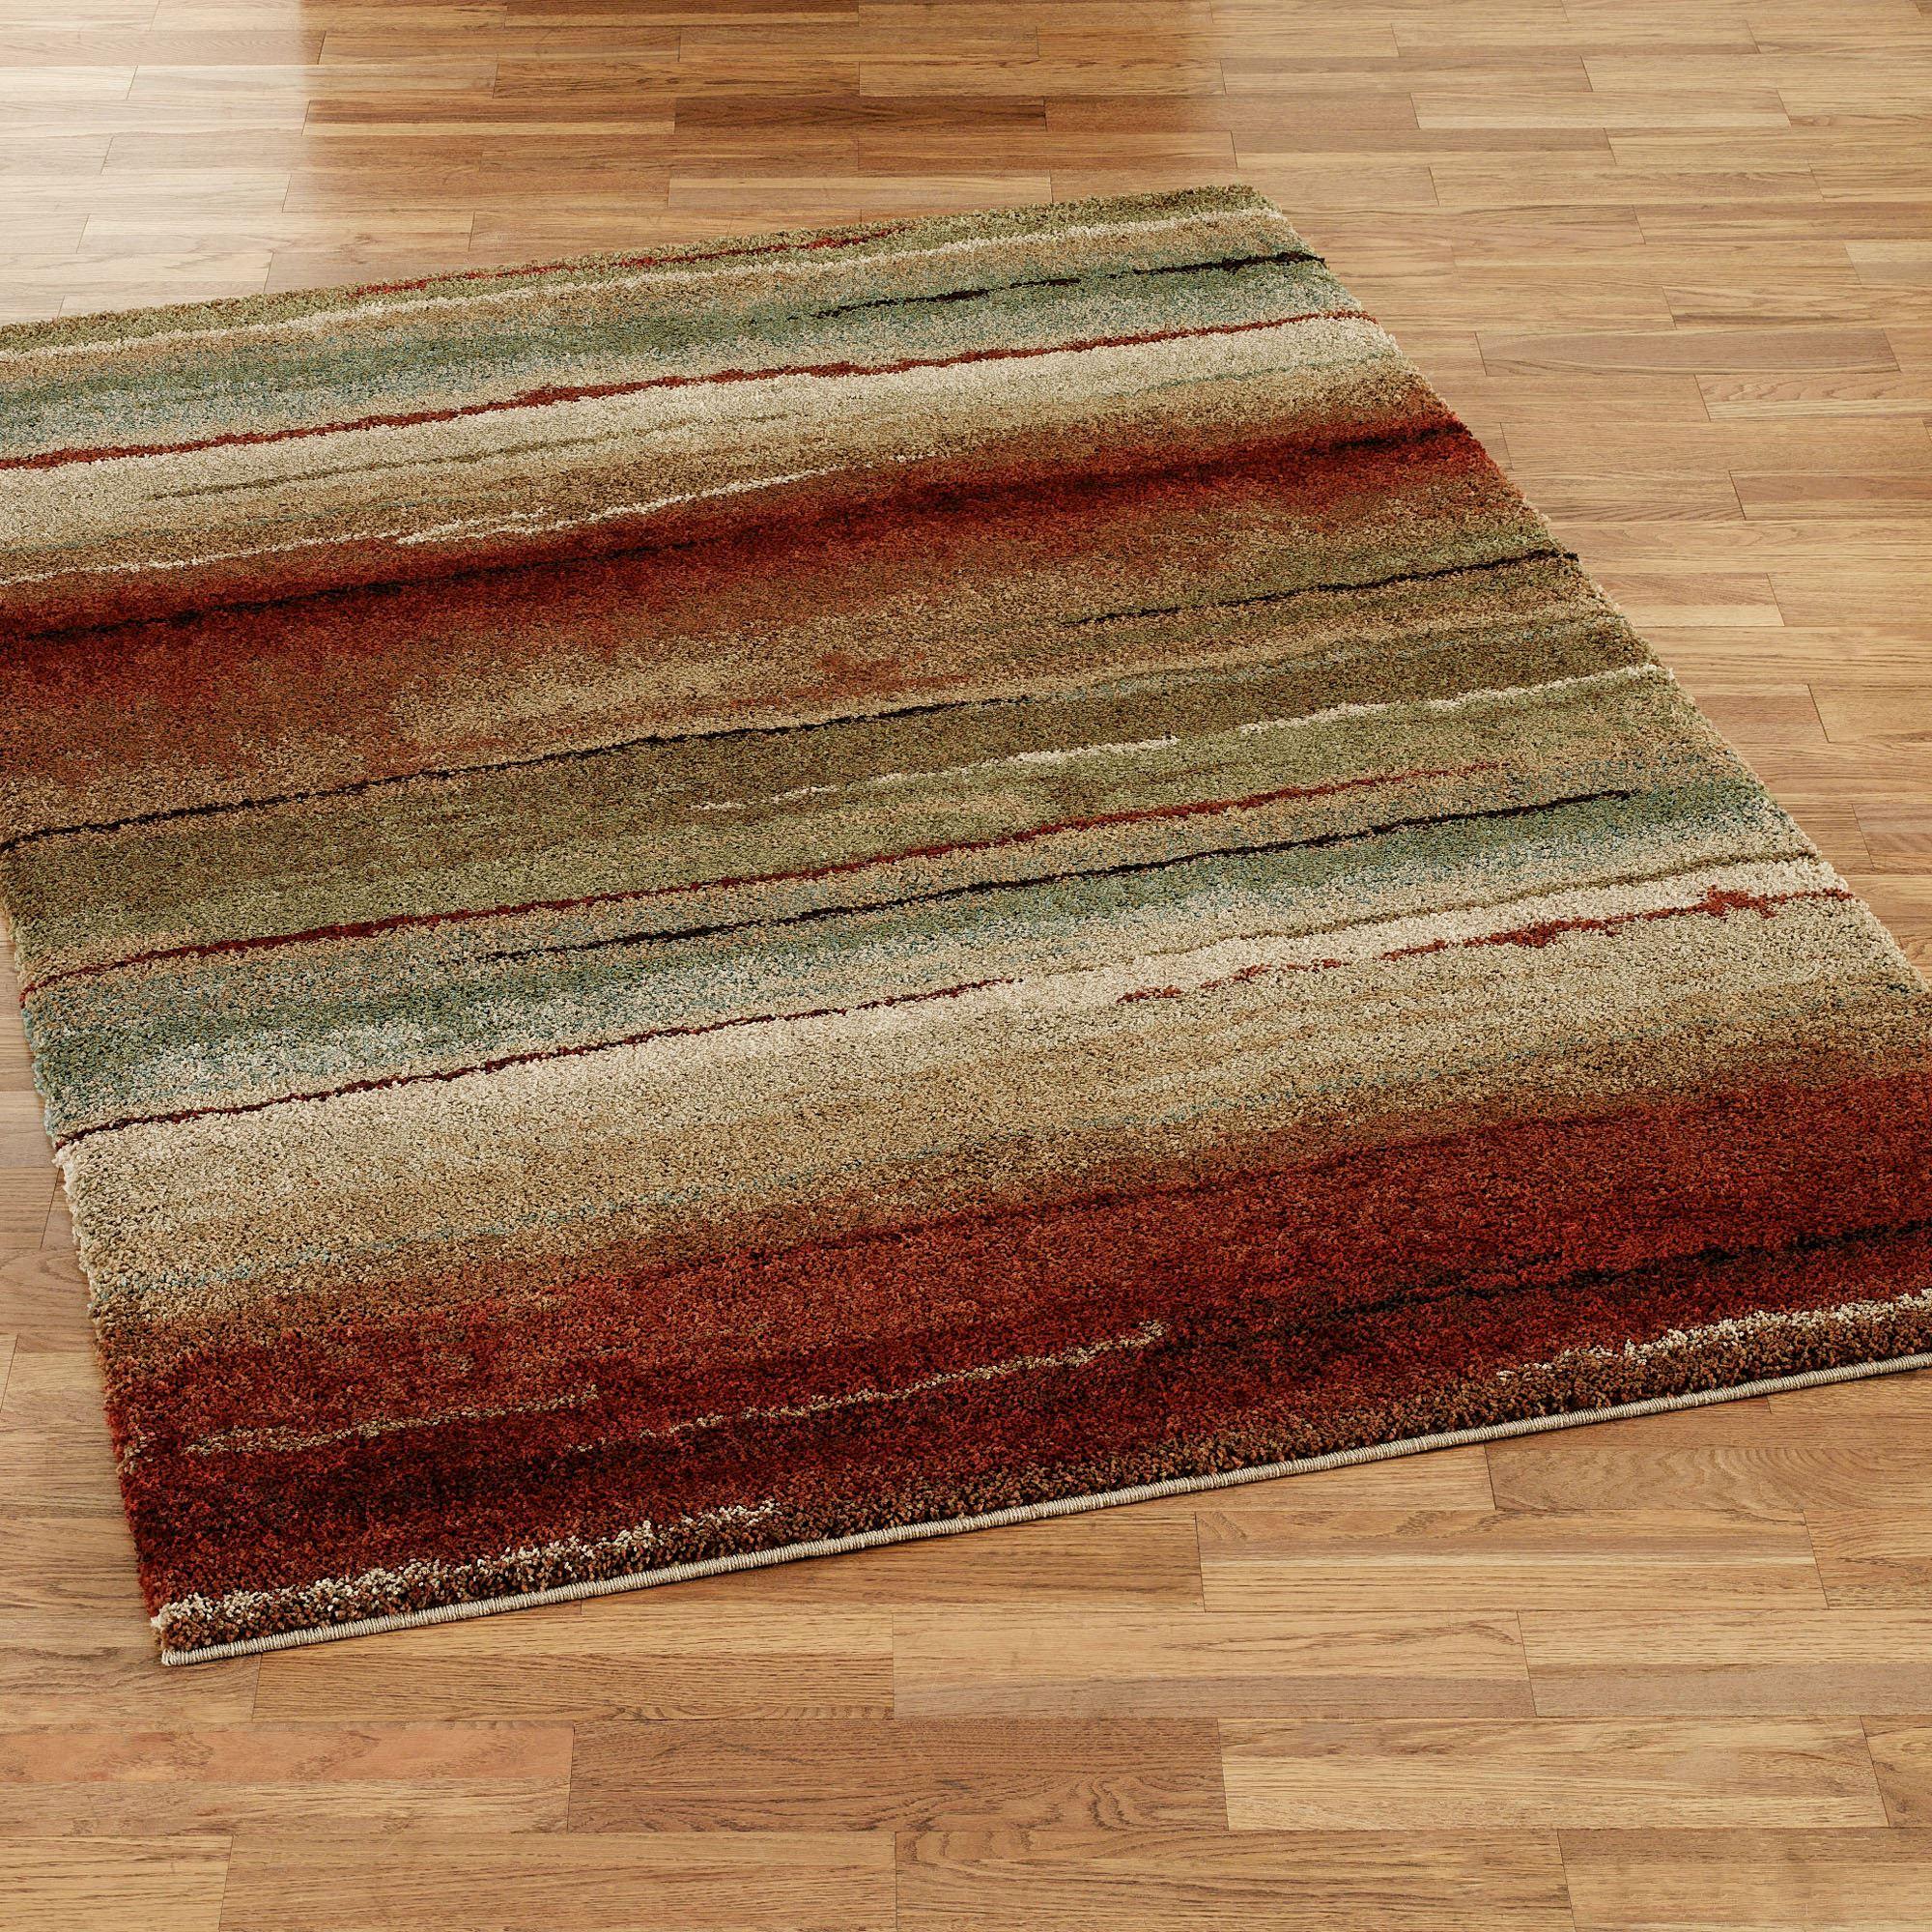 shag area rugs dusk to dawn rectangle rug multi jewel GCEIMSK